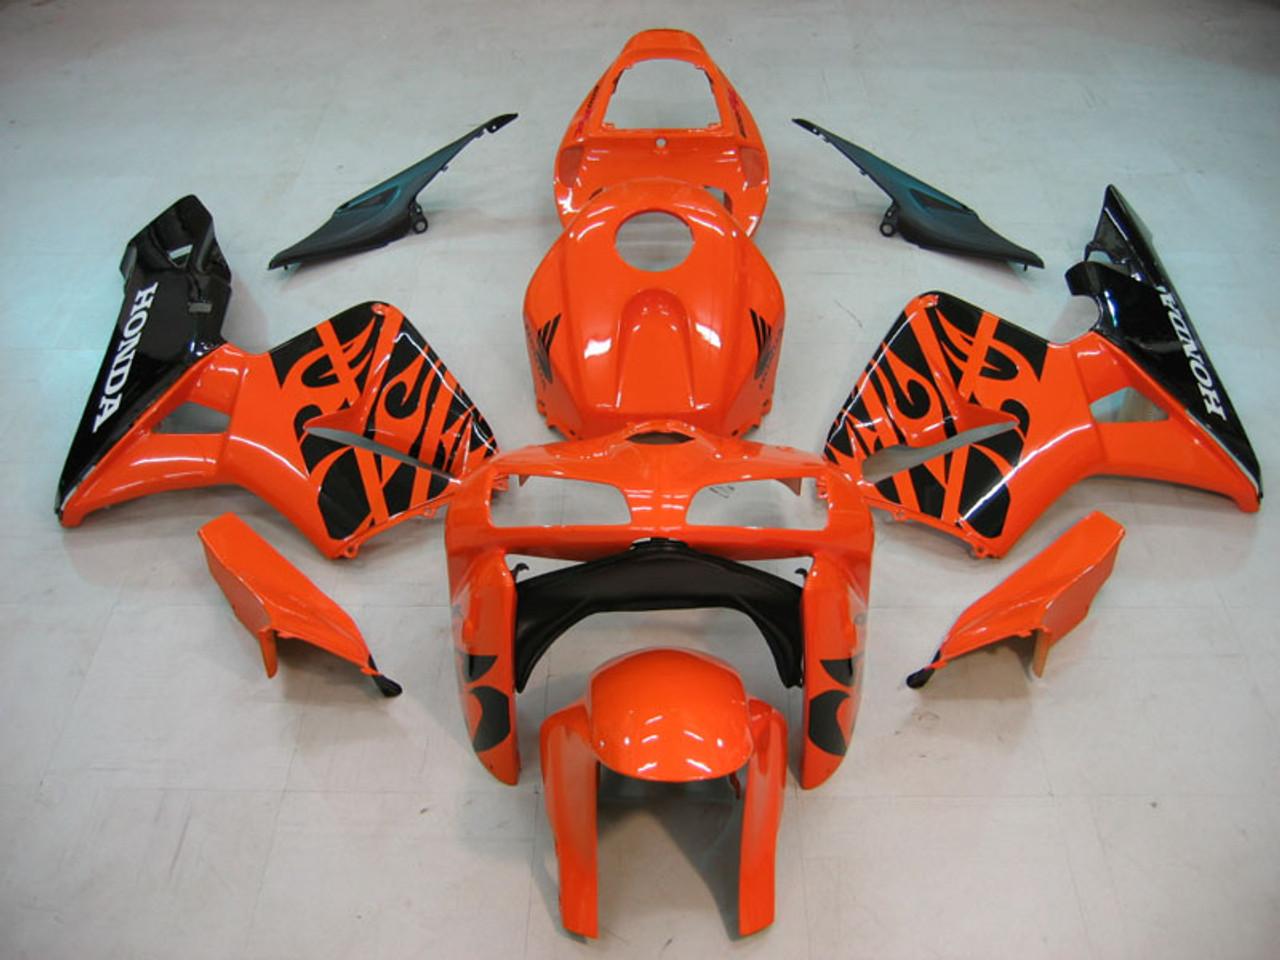 Fairings Honda CBR 600 RR Orange & Black Tribal Honda Racing (2005-2006)